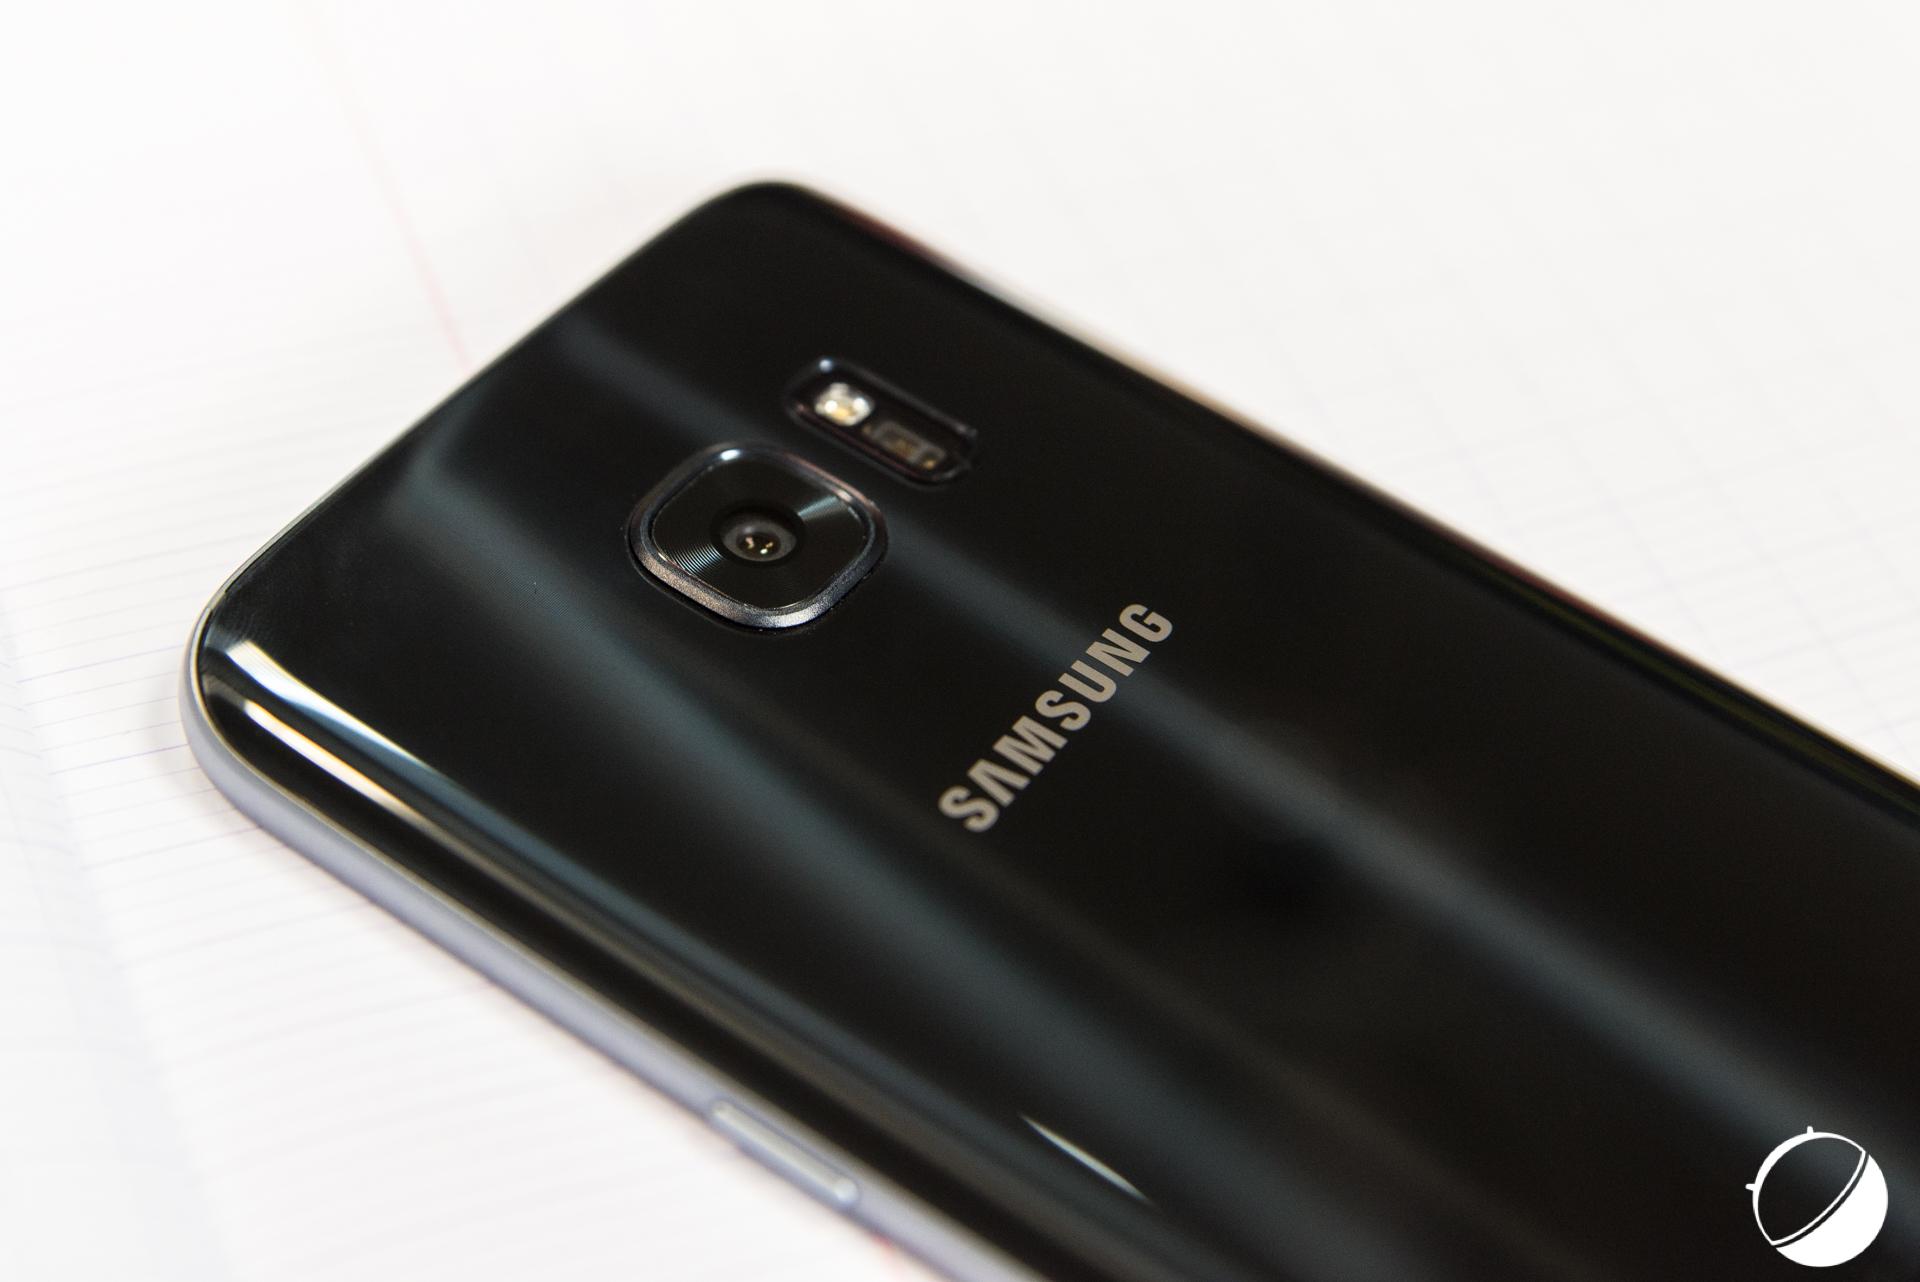 Vidéo : Notre test du Samsung Galaxy S7 edge